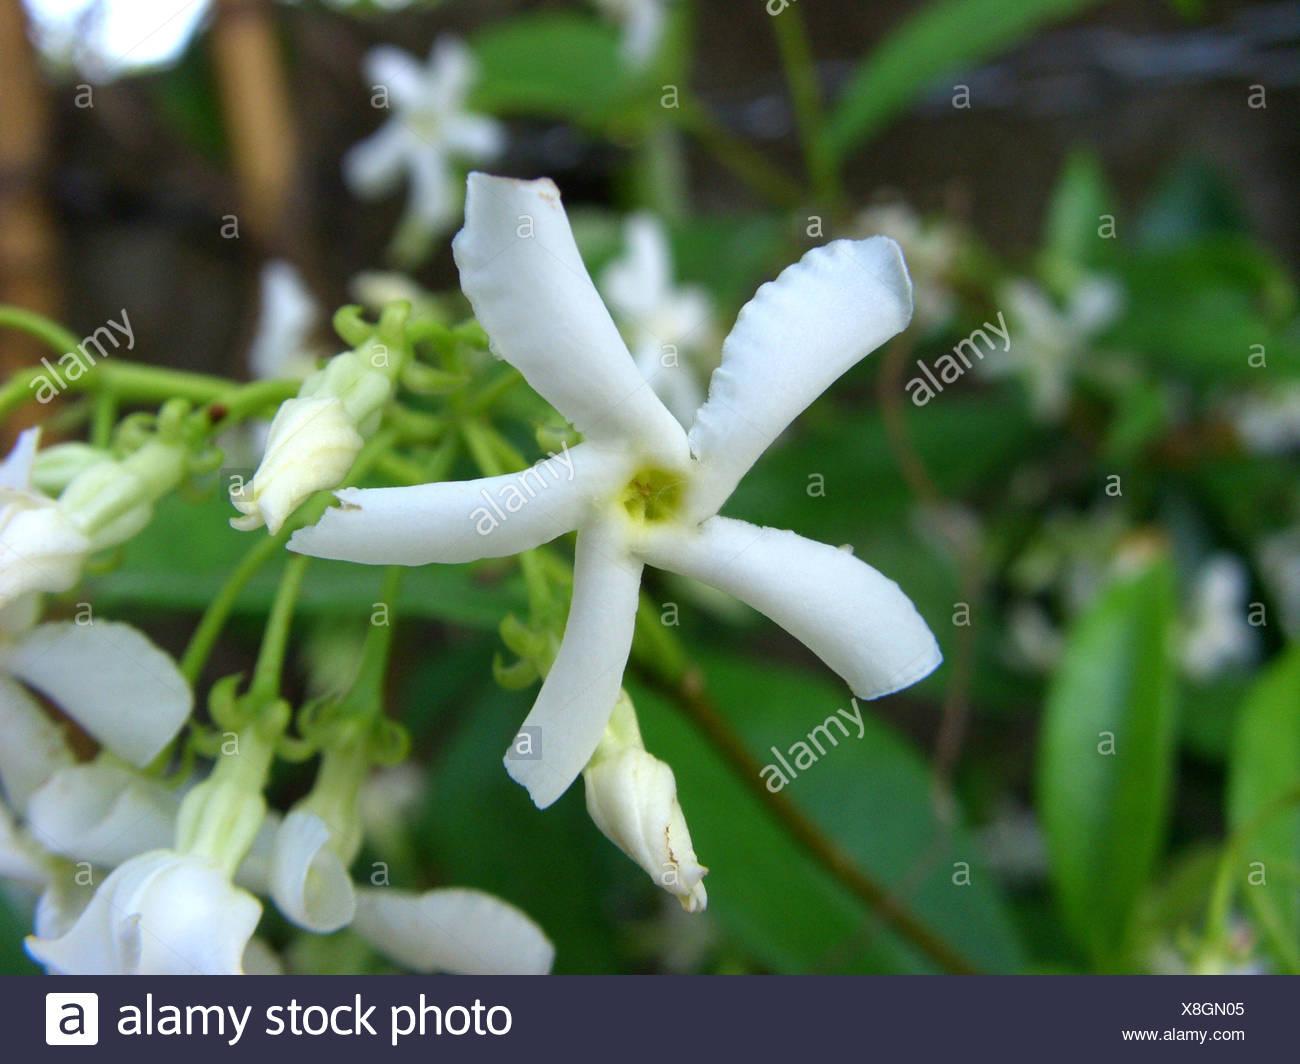 Star Jasmine Trachelospermum Jasminoides Flower Stock Photo